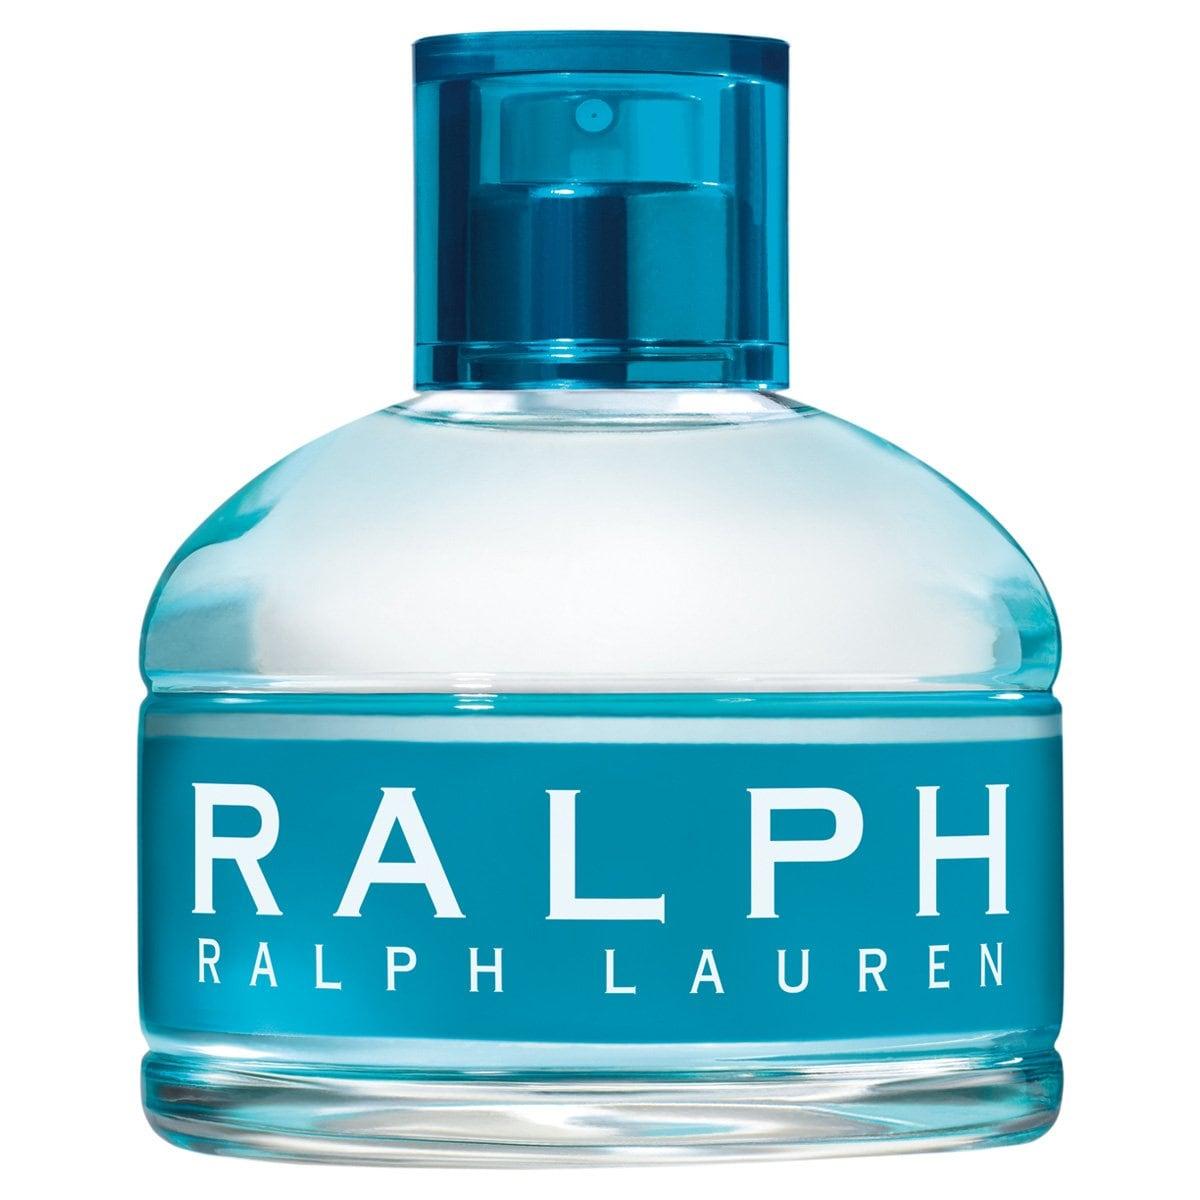 Ralph Lauren Eau de Toilette Spray (100Ml)